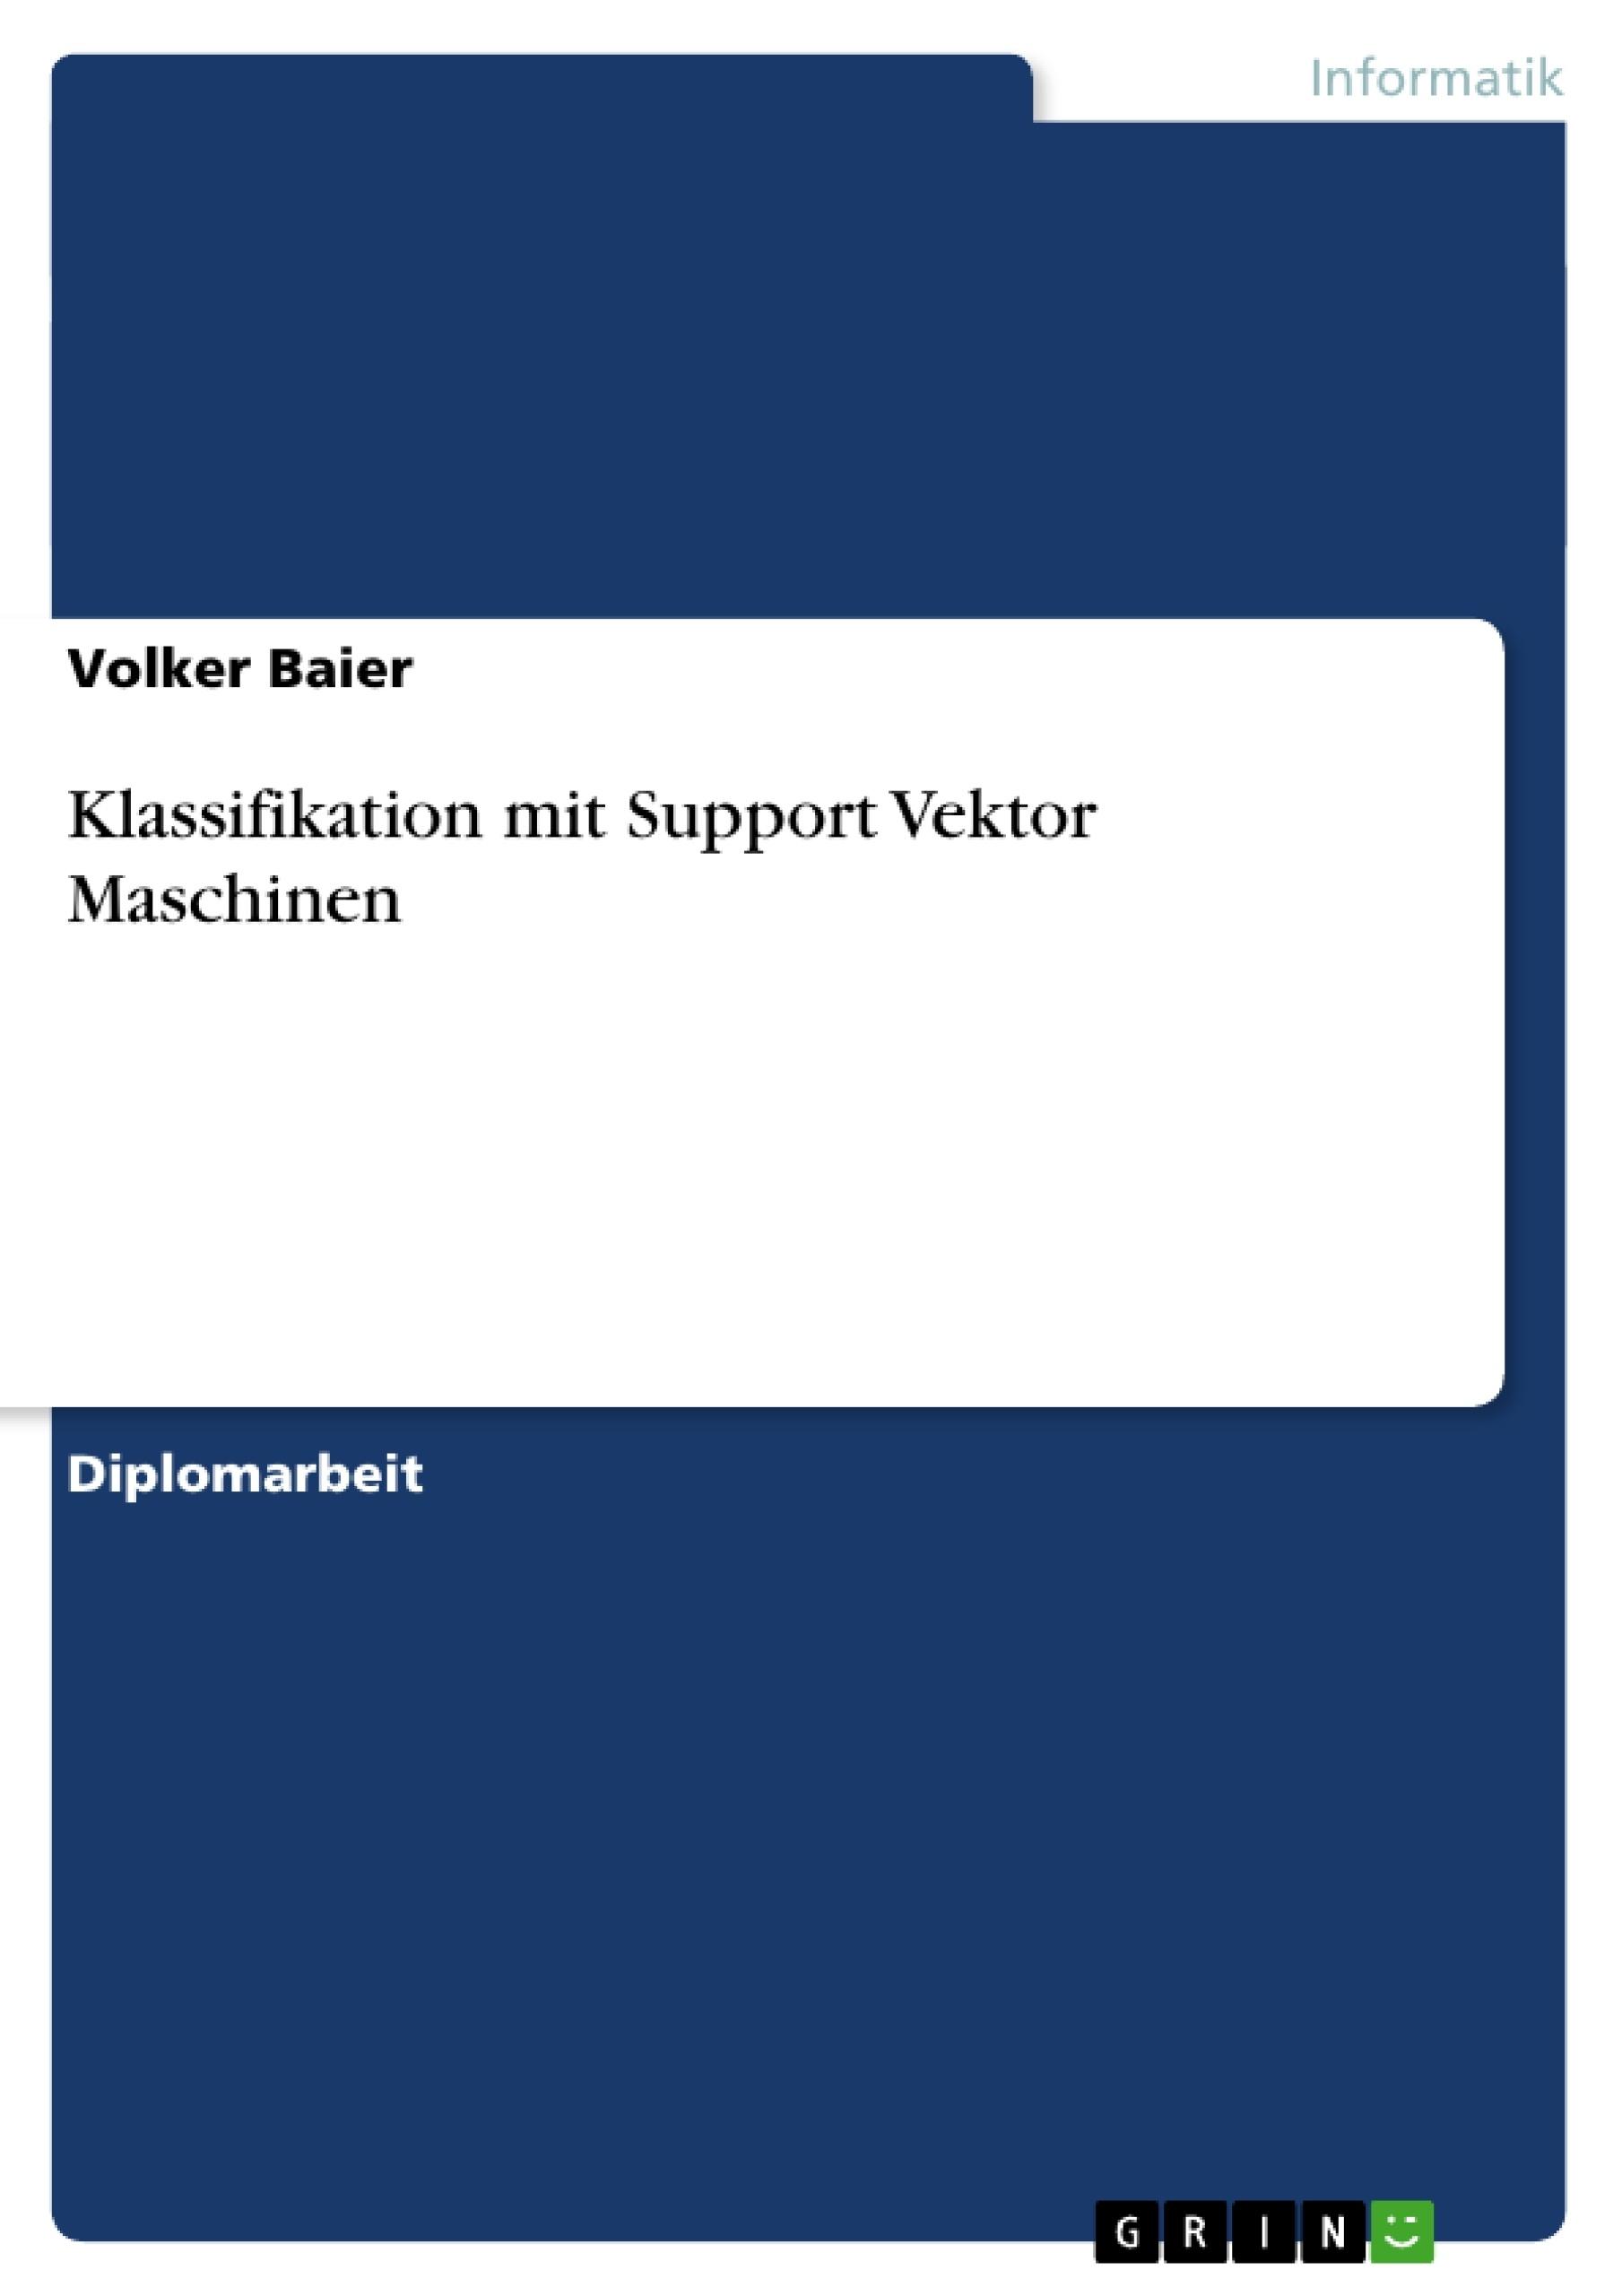 Titel: Klassifikation mit Support Vektor Maschinen